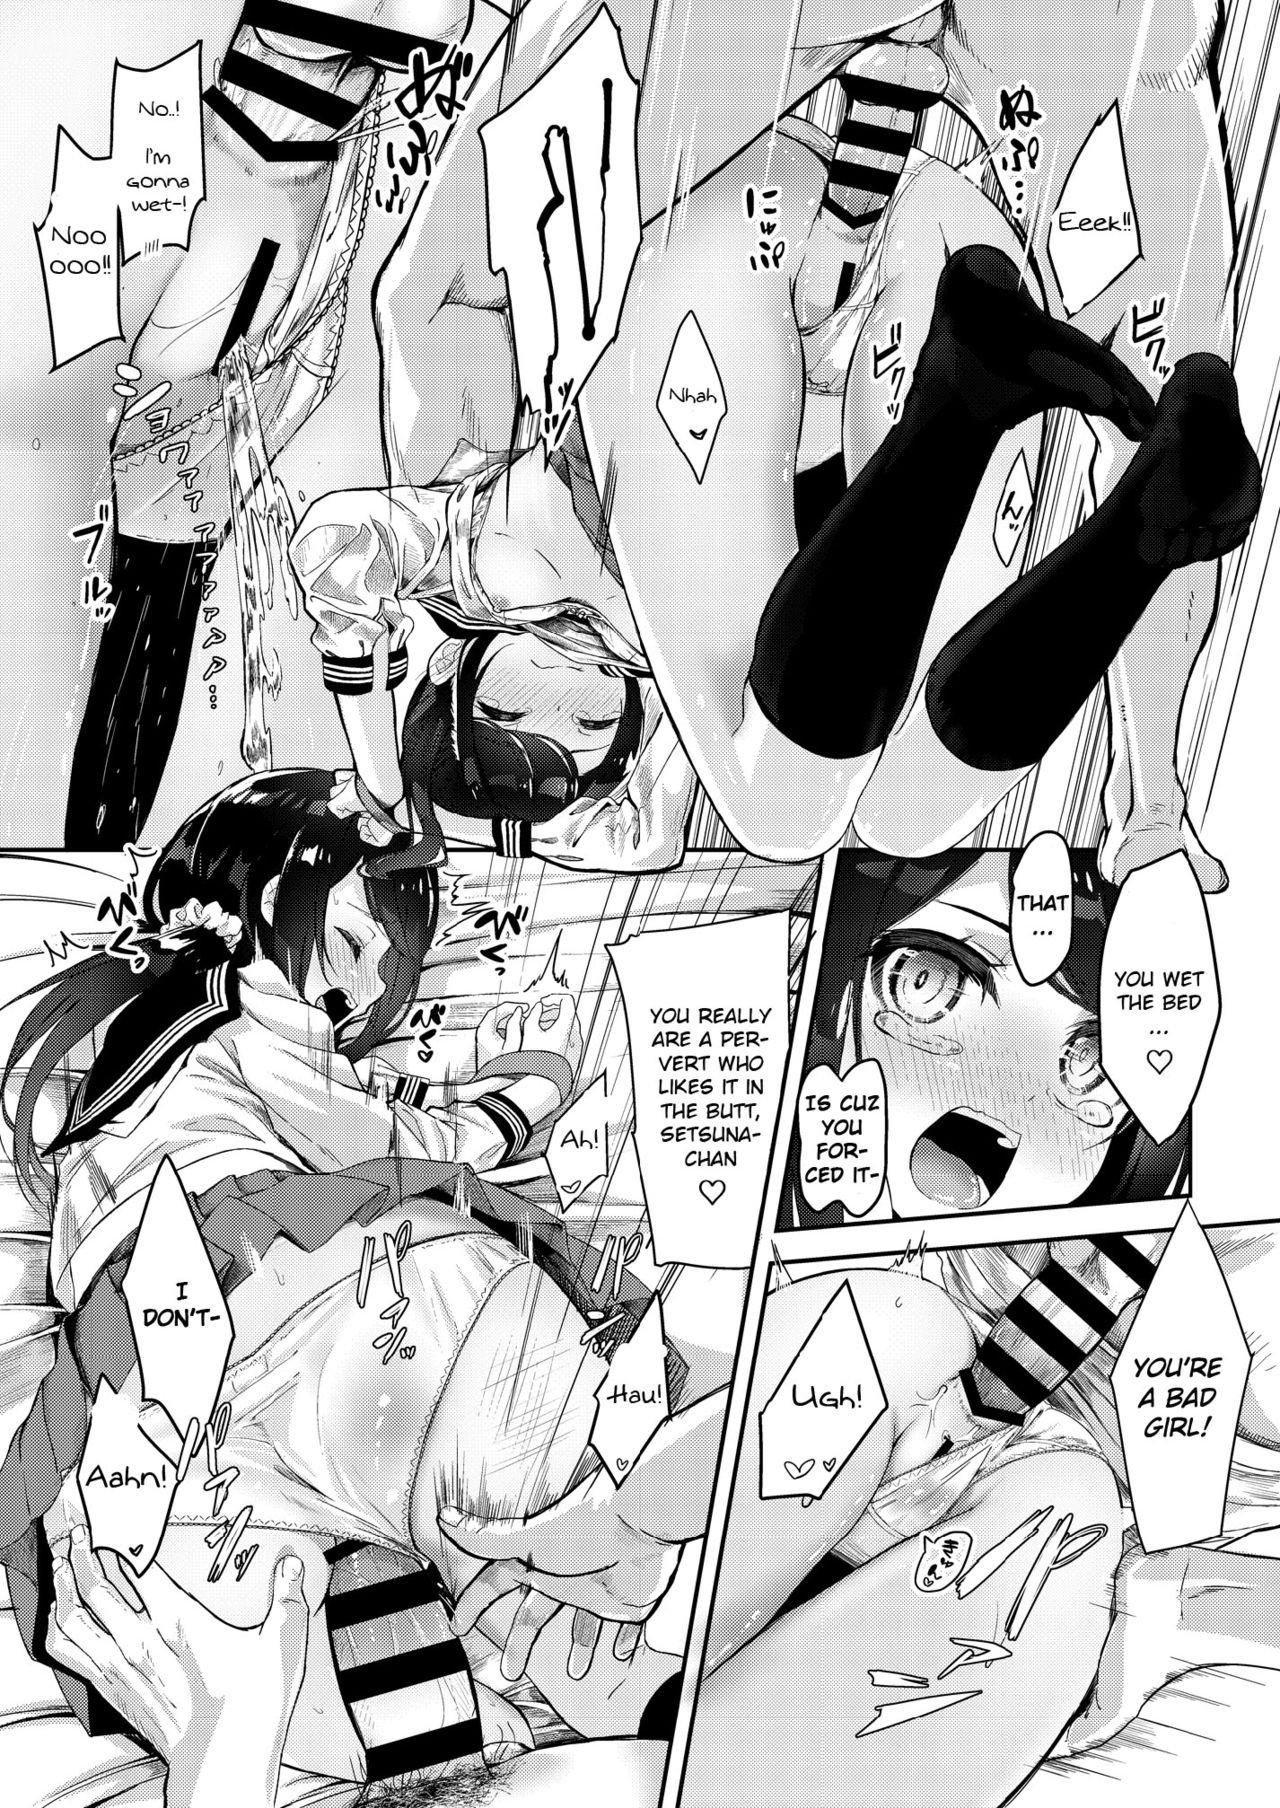 [Pleats Time (Nunnu)] Sister Breeding - Gimai Tsukimiya Setsuna Oshioki Ecchi Hen | Sister Breeding - Punishment Sex Edition with Step-sister Tsukimiya Setsuna [English] [Douzo Lad Translations] [Digital] 11